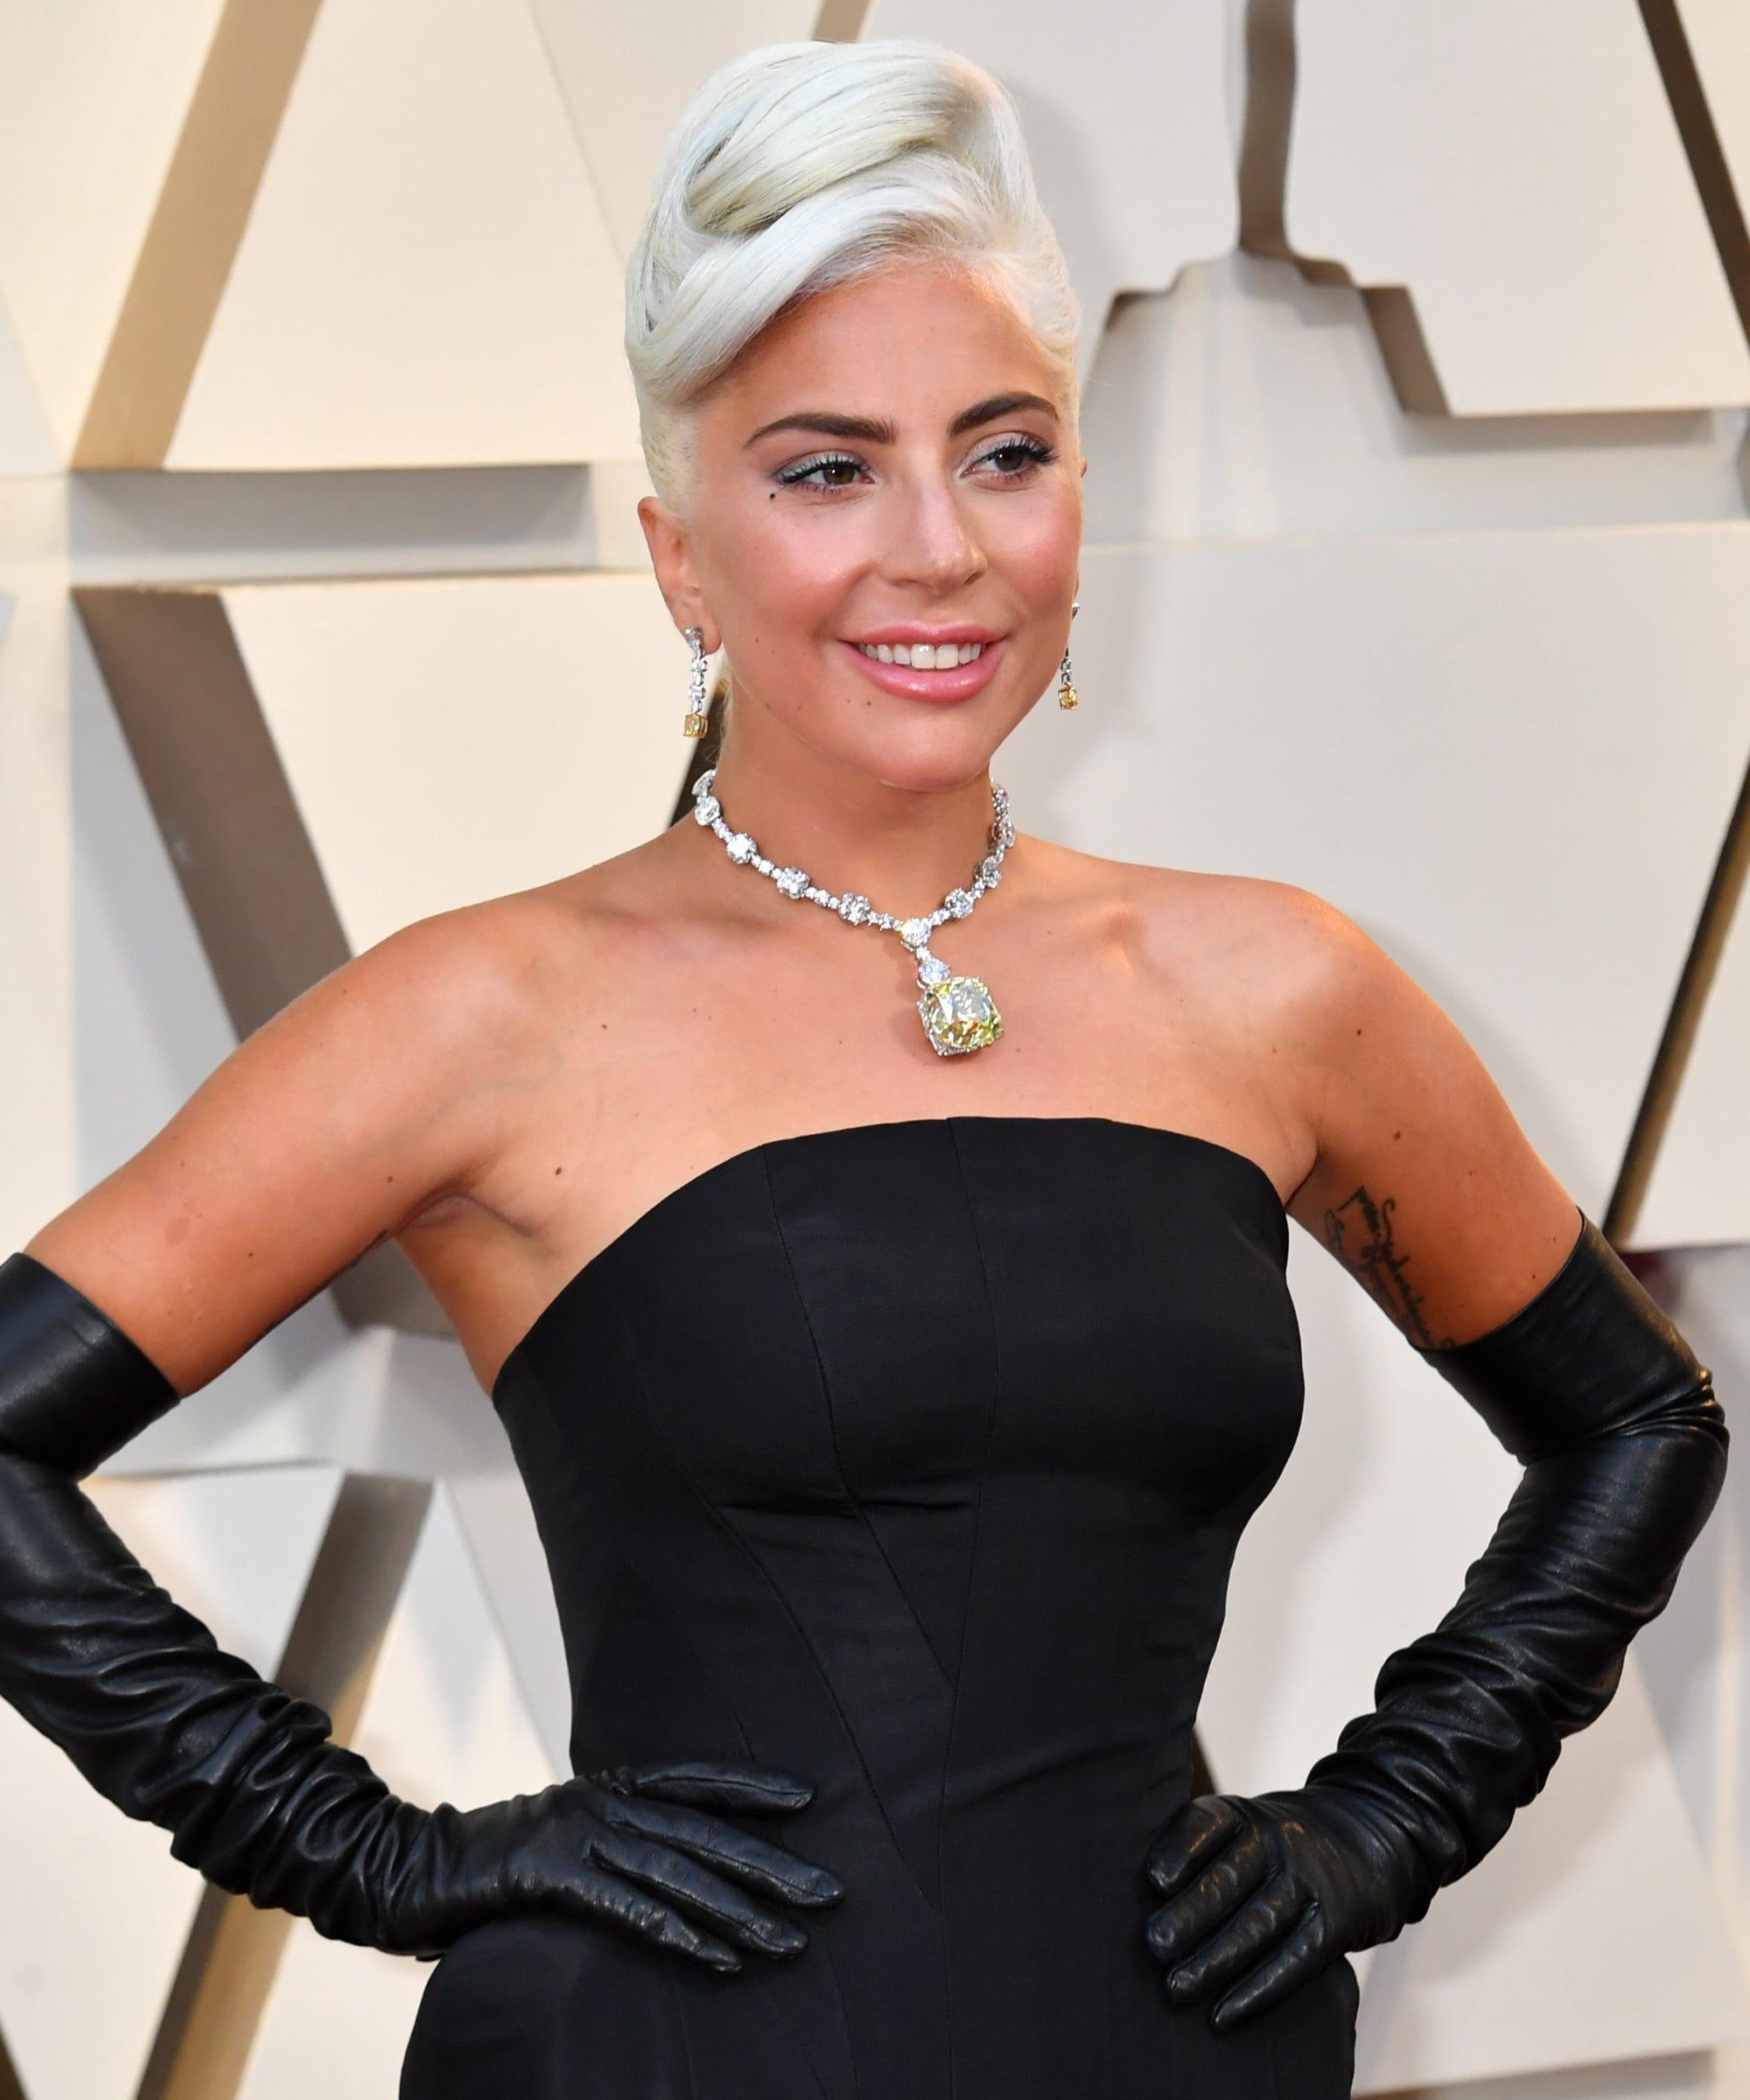 Lady Gaga's Foundation & Starbucks Are Raising Money To Help LGBTQ Youth